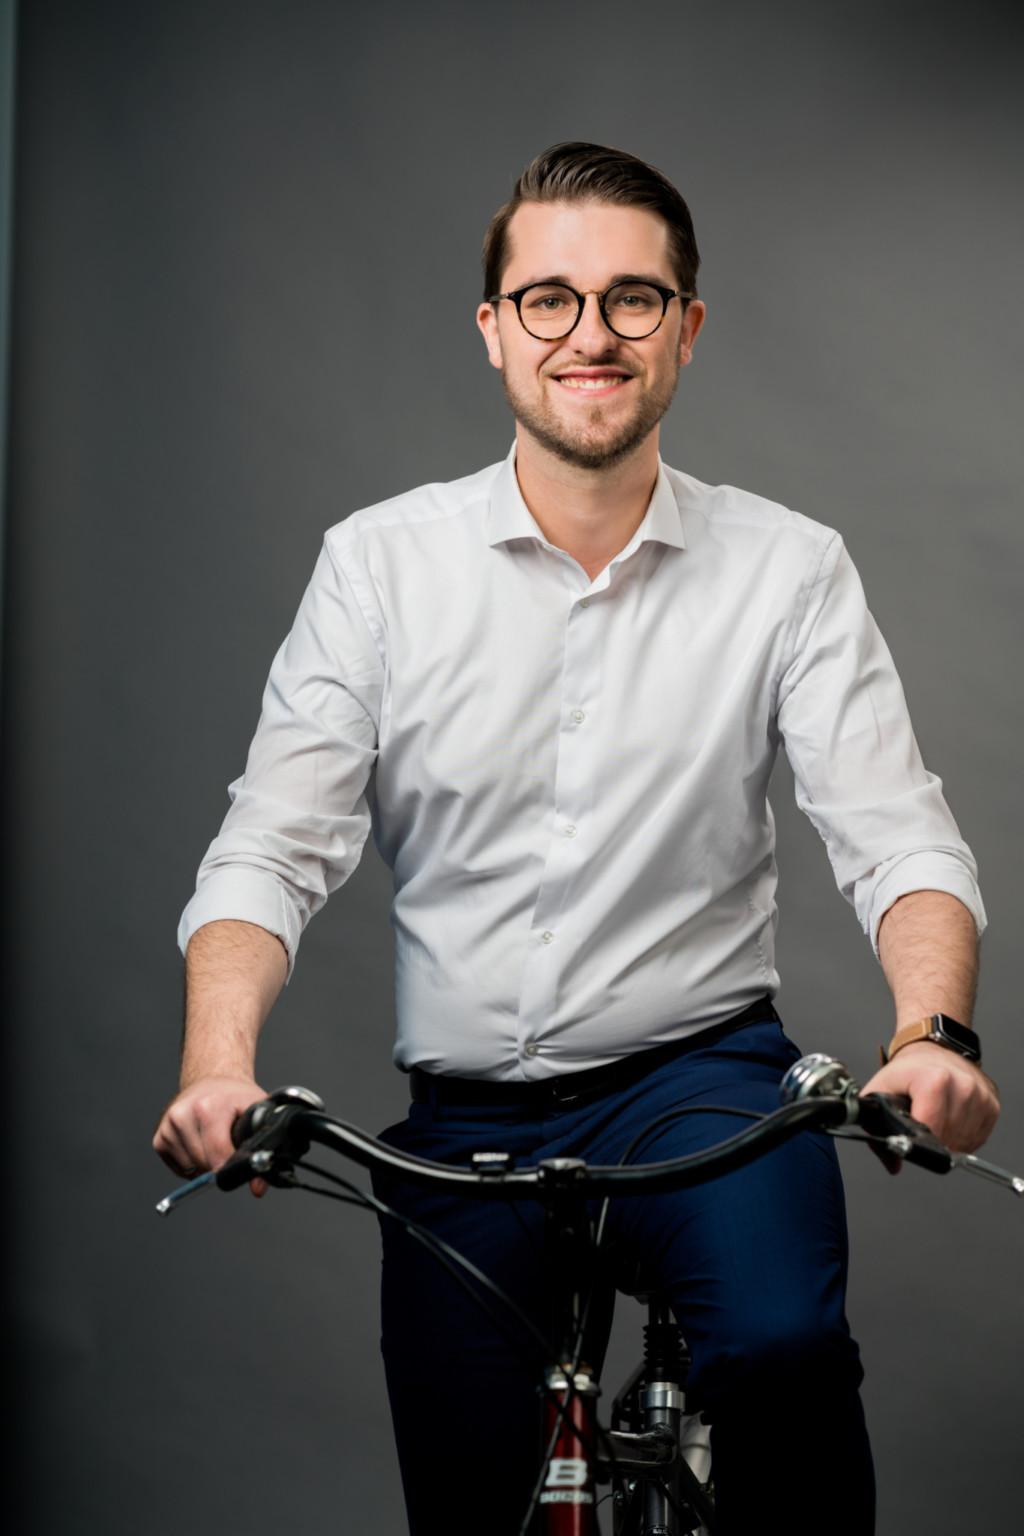 Marlo Kratzke auf dem Fahrrad